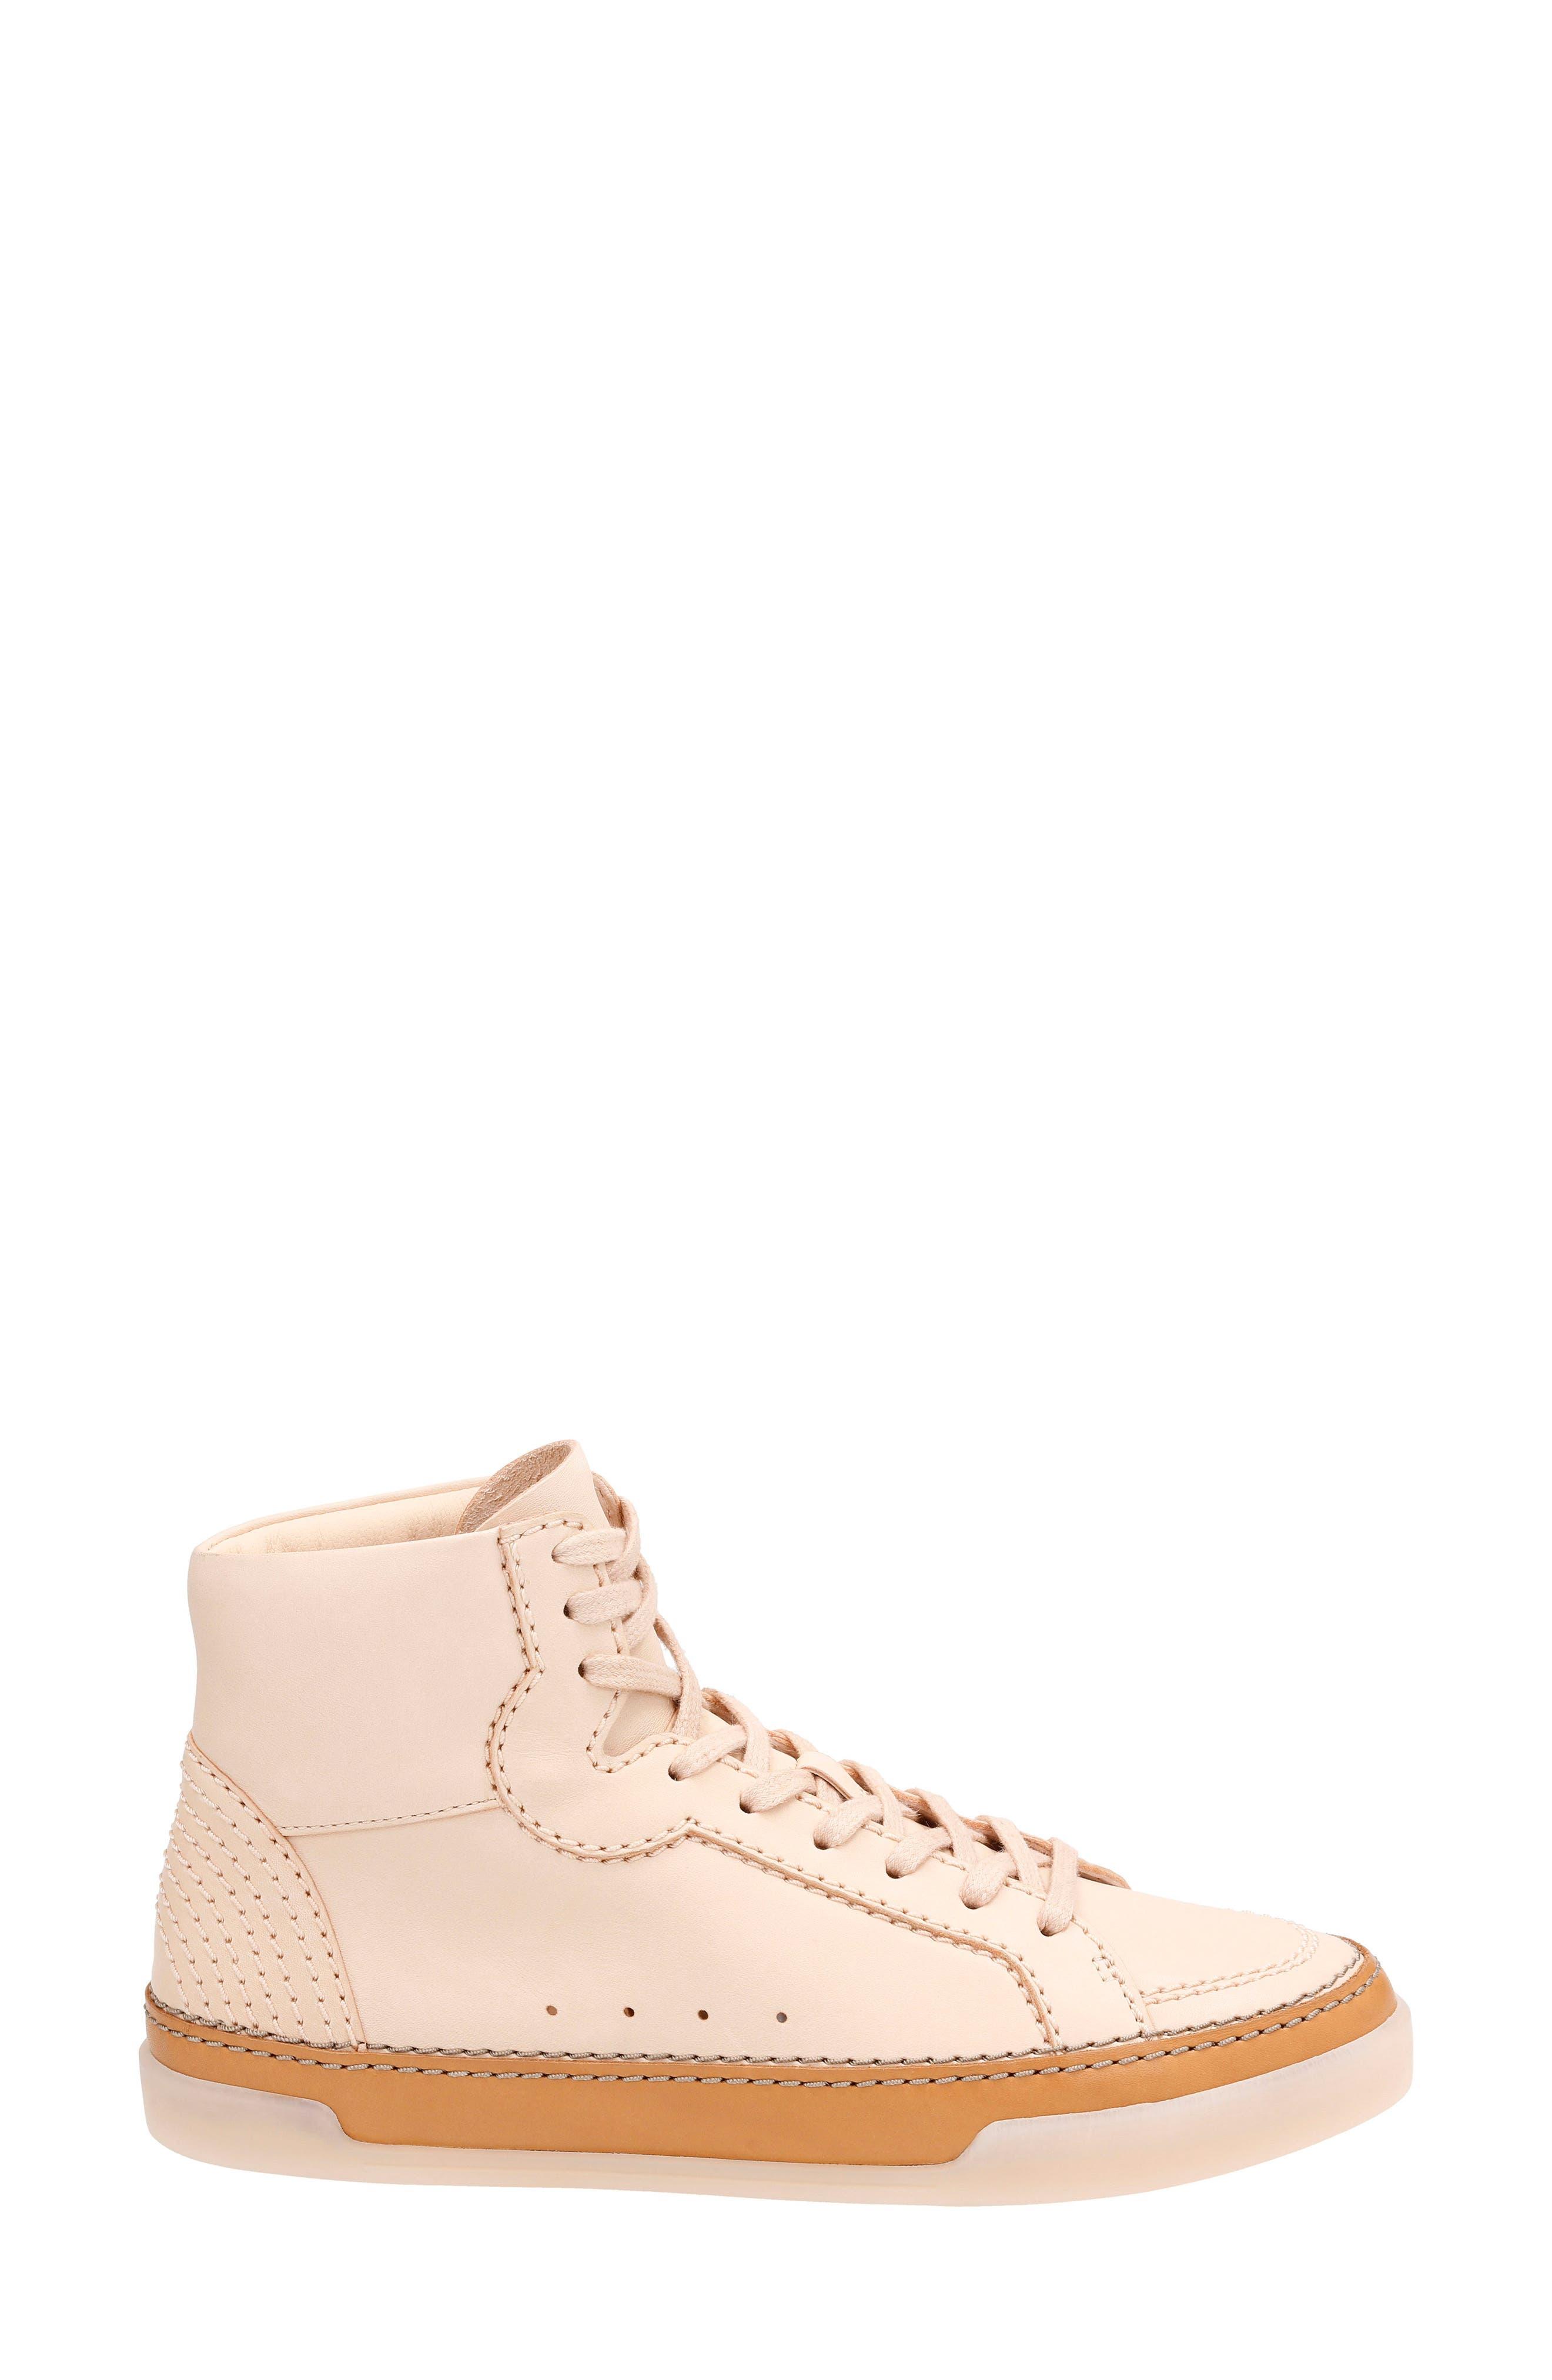 Hidi Haze High Top Sneaker,                             Alternate thumbnail 6, color,